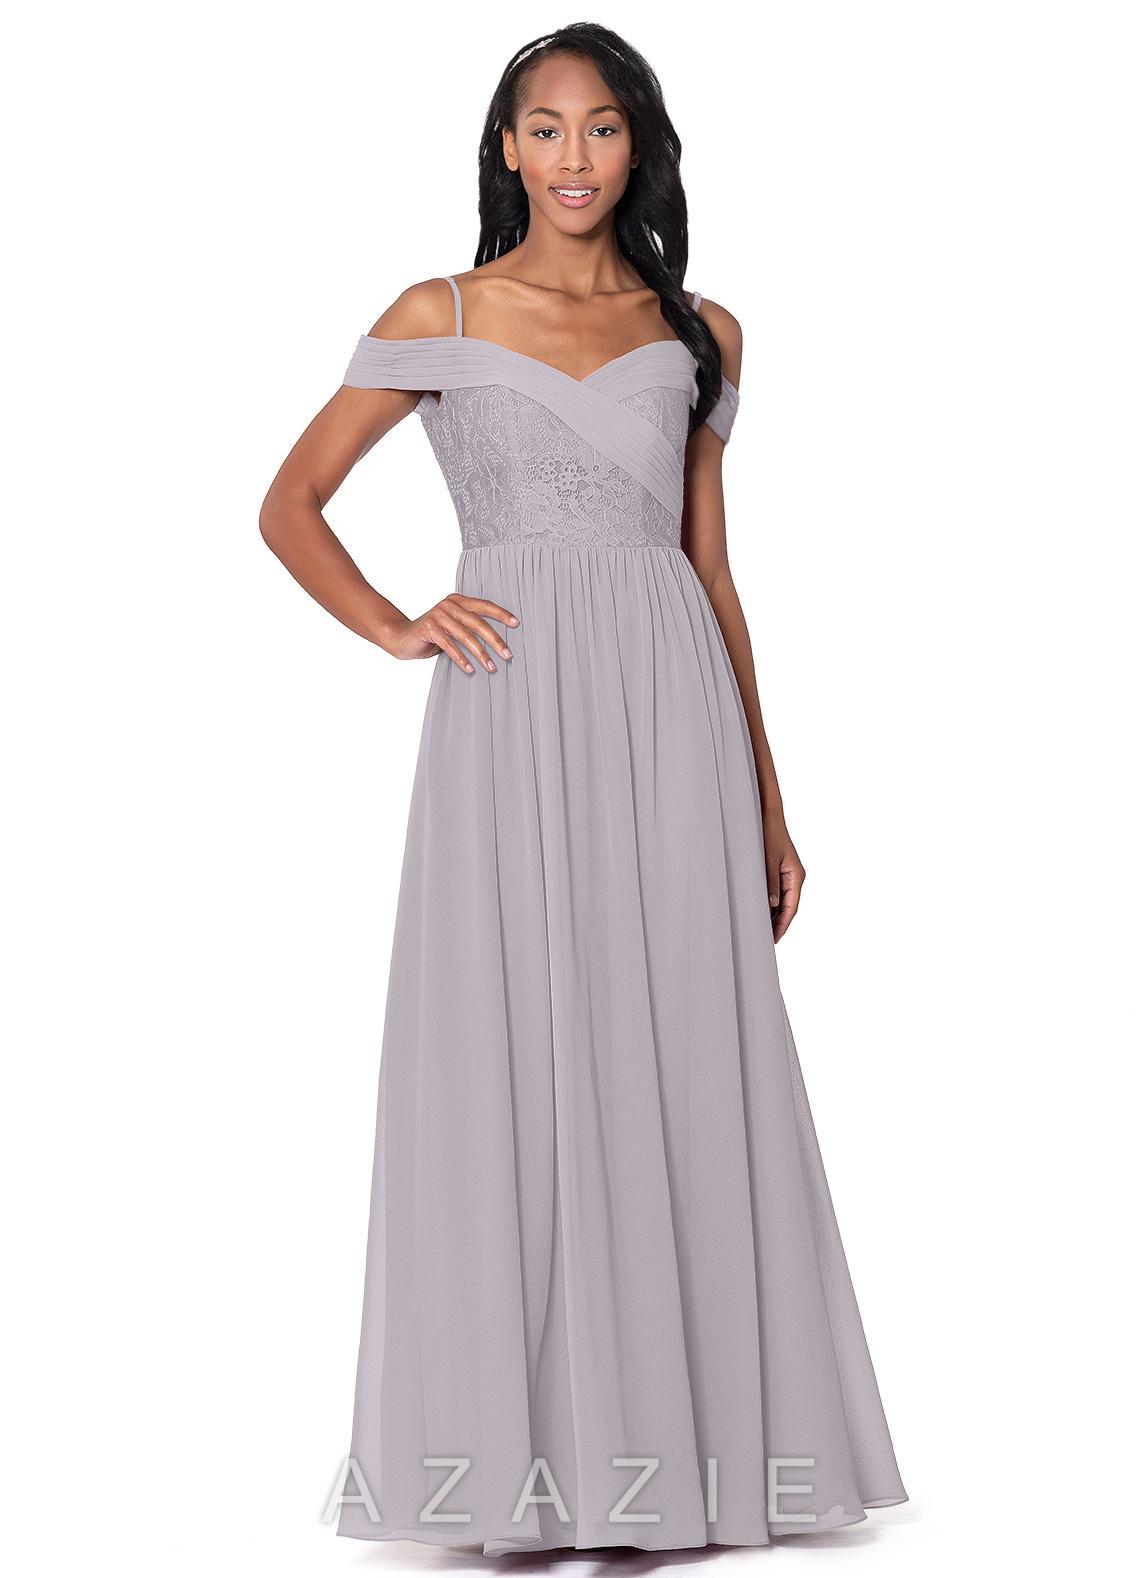 2287da7cedc Azazie Leona Bridesmaid Dress